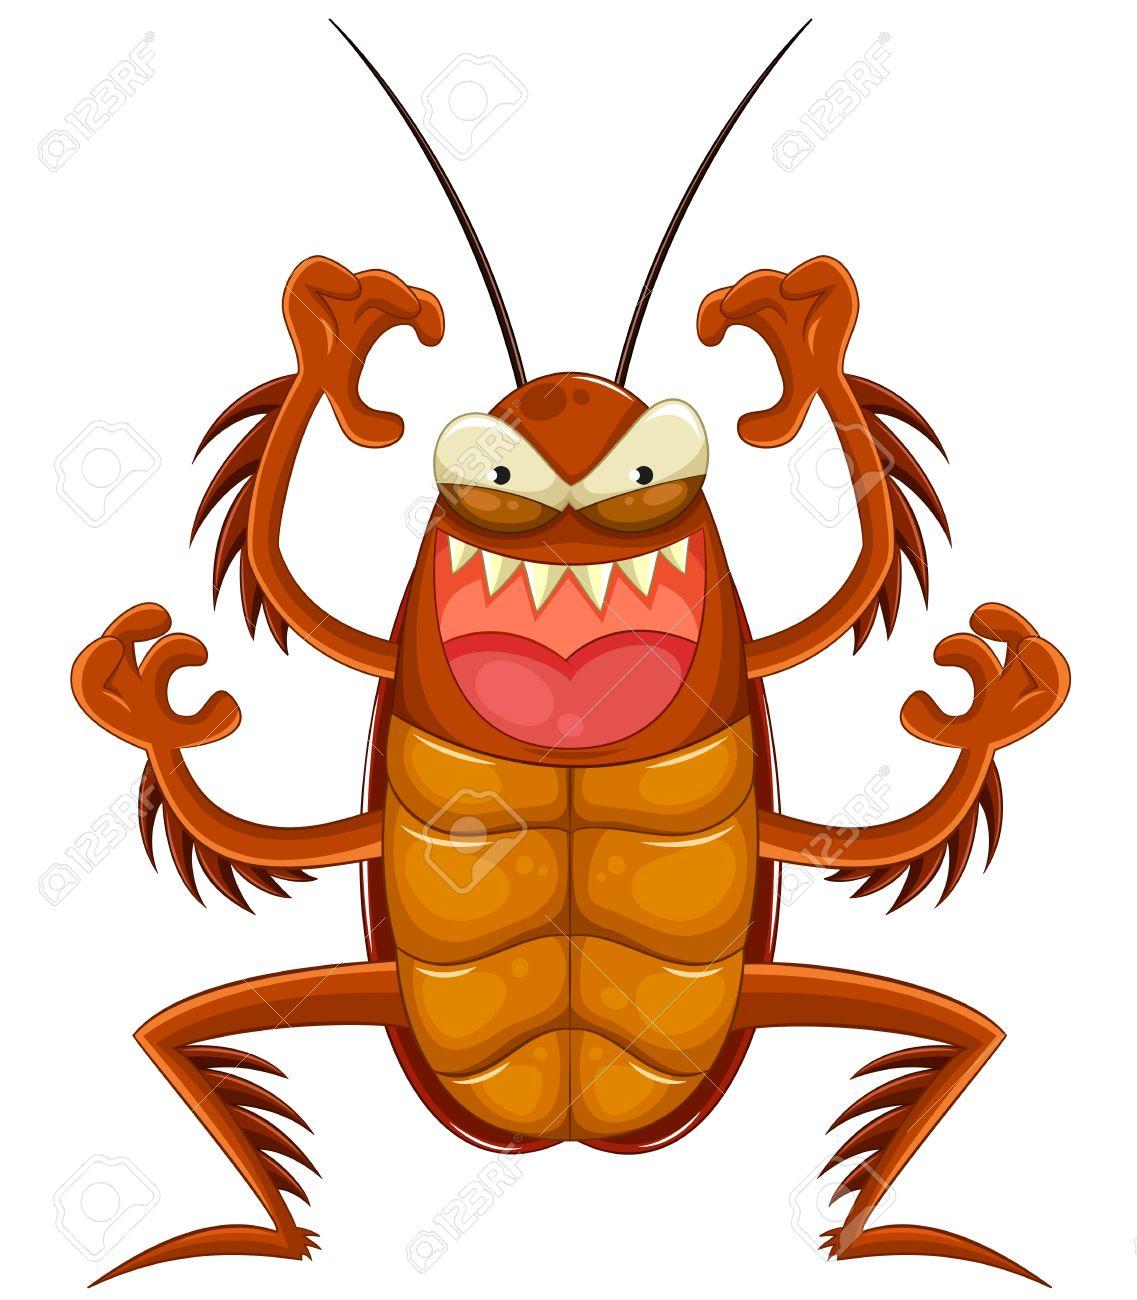 Cockroach Clipart